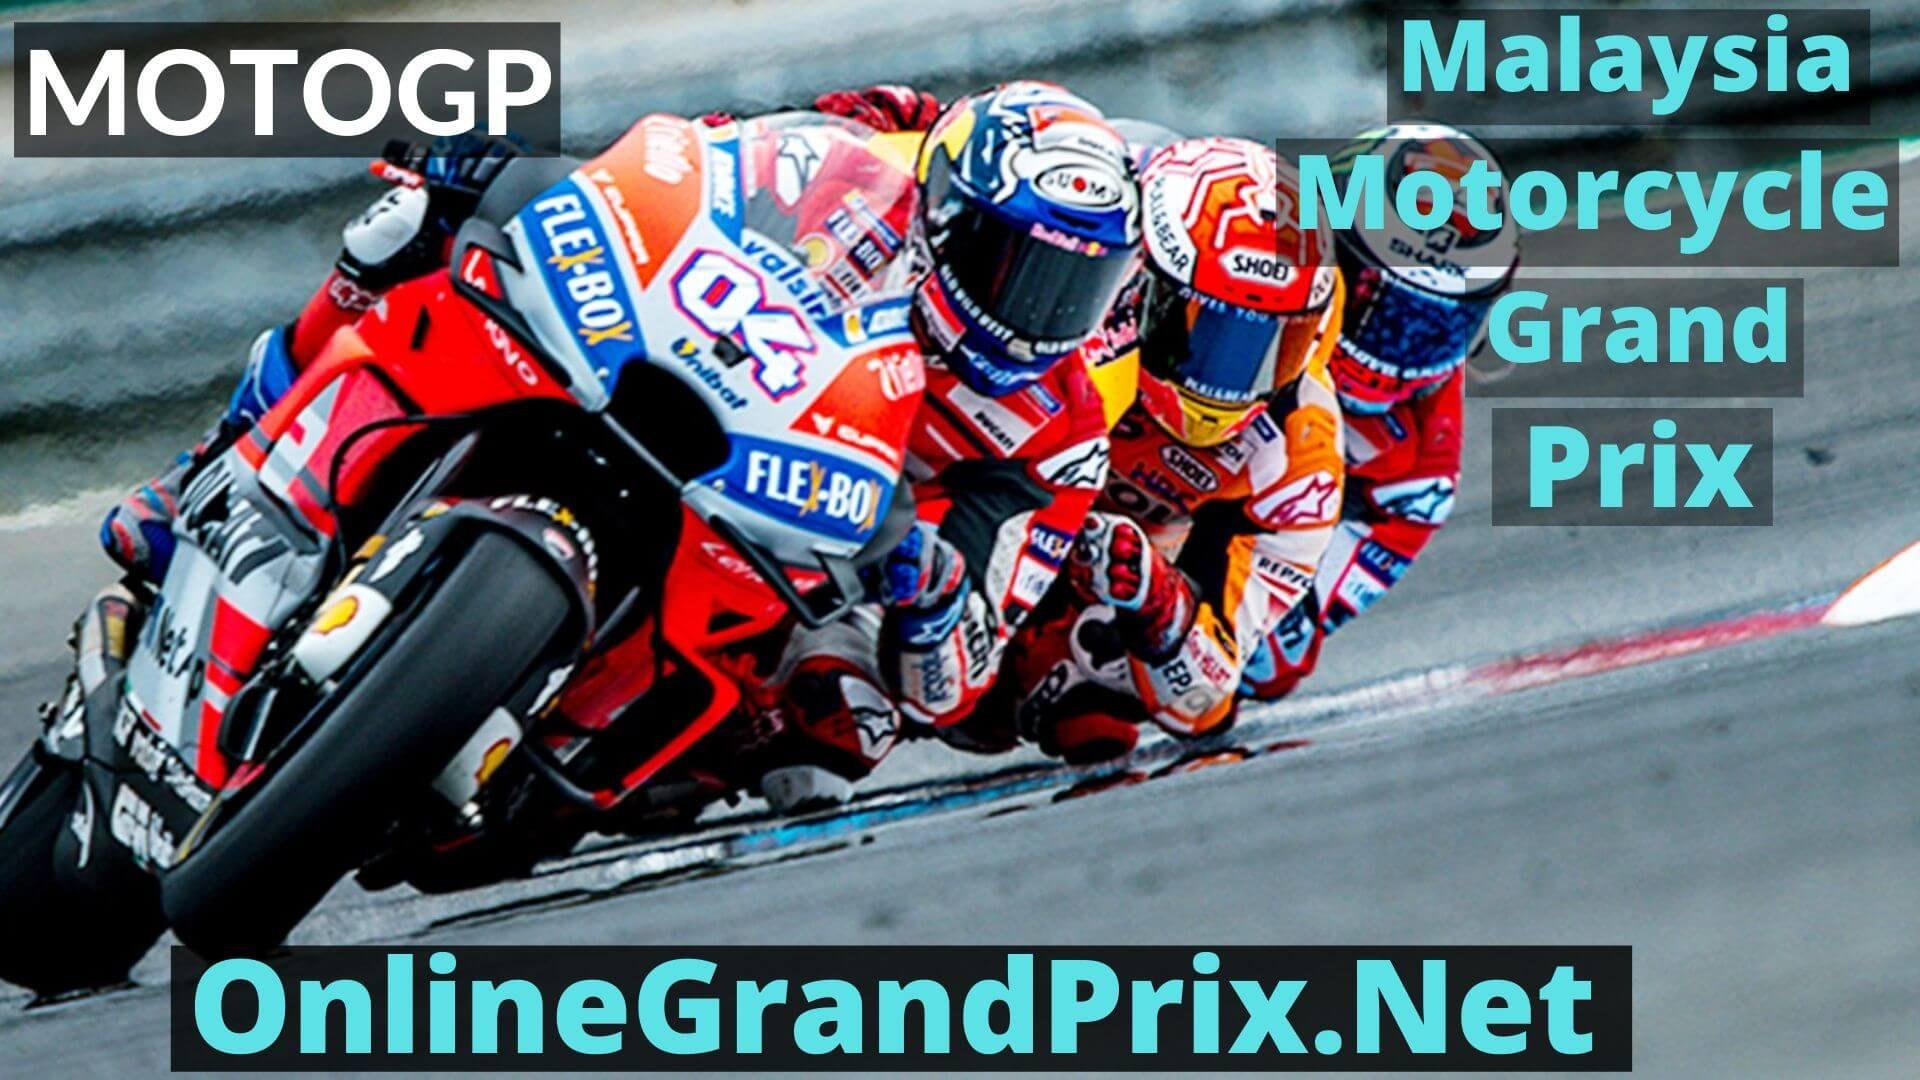 Malaysia Motorcycle Grand Prix Live Stream 2020 | MotoGP